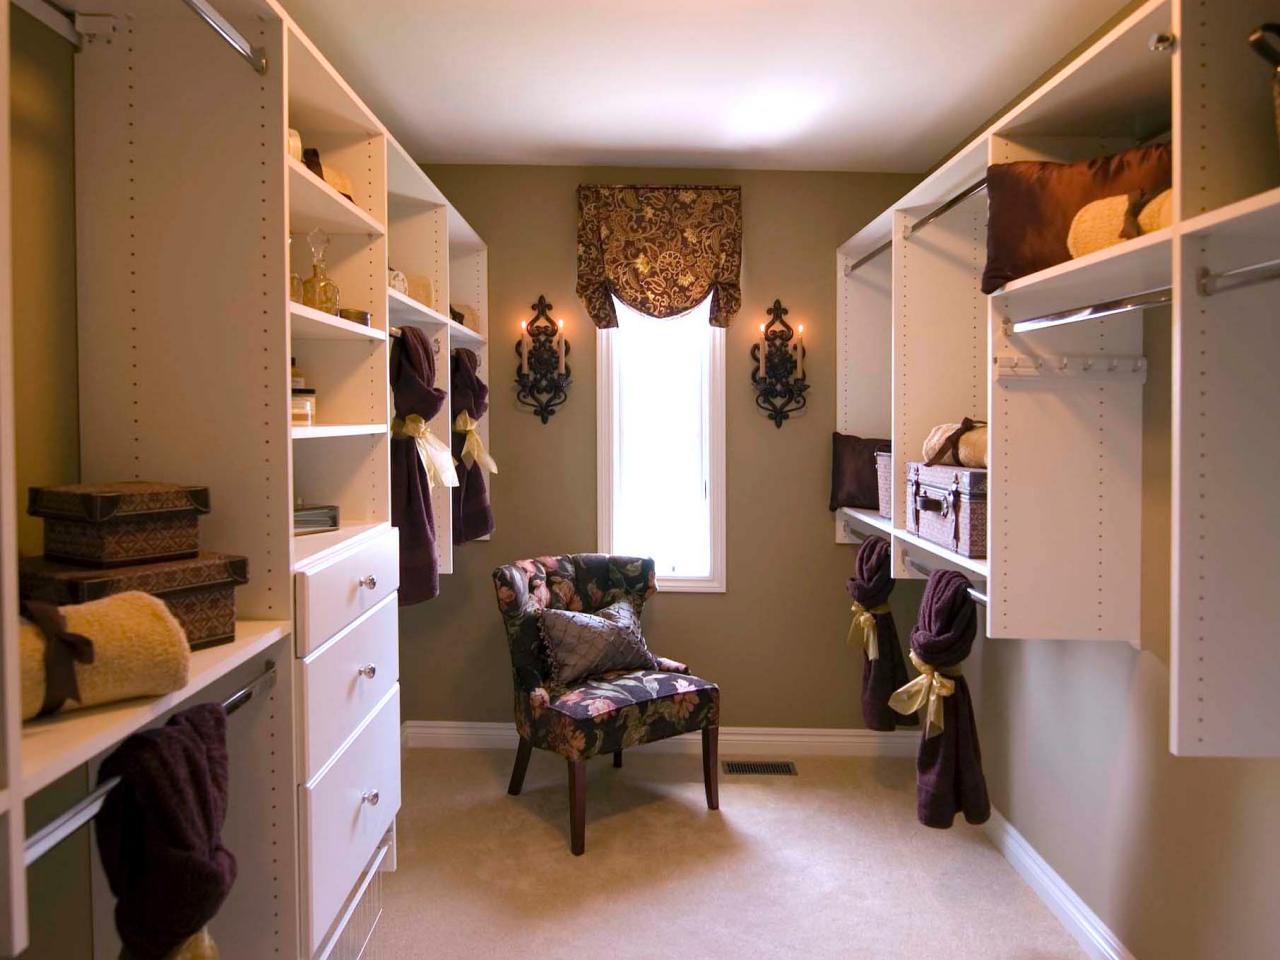 Convert Bedroom To Closet 10 ways to get the walk-in closet of your dreams | hgtv's